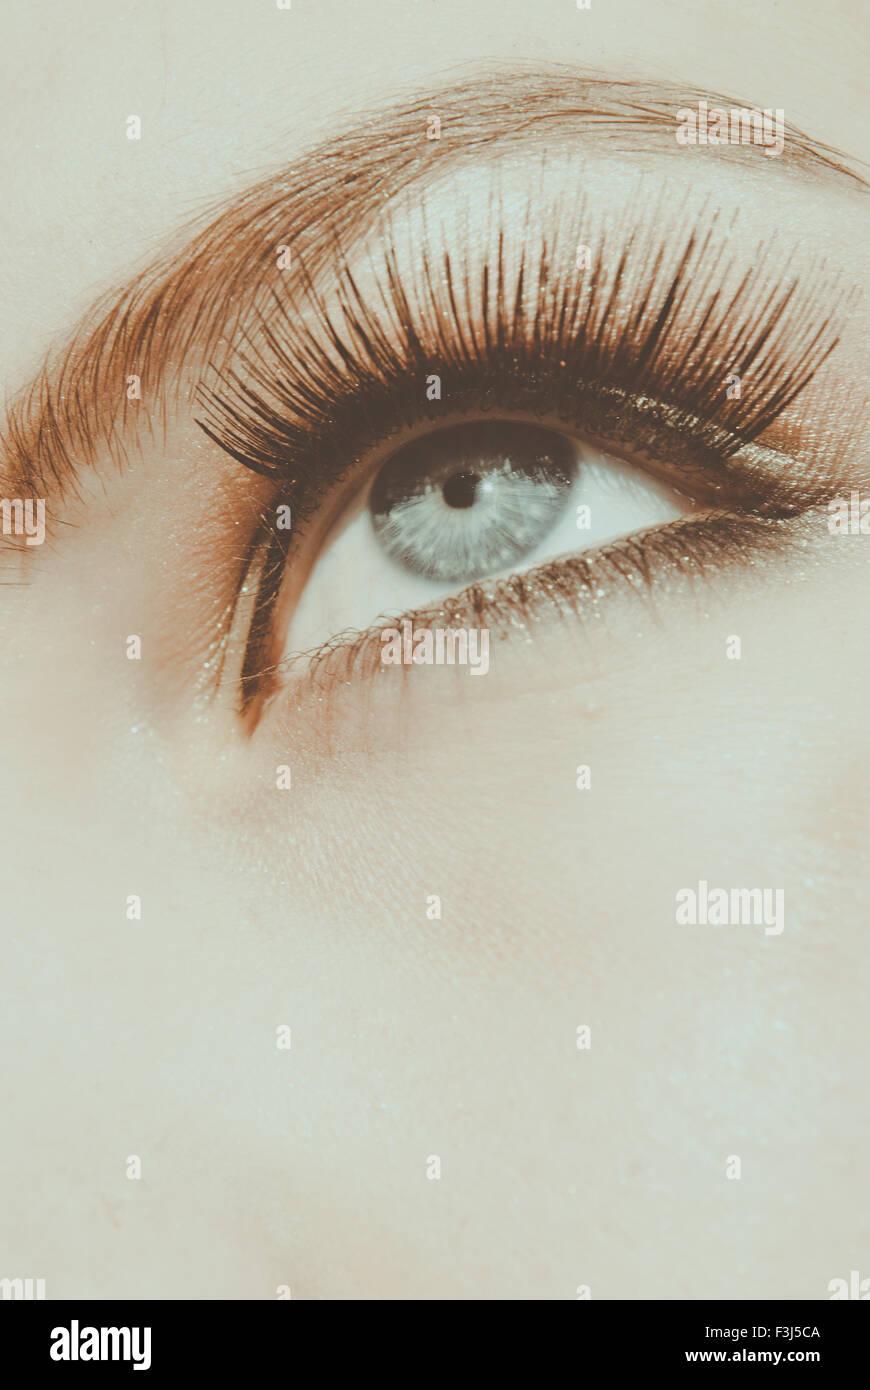 Beauty-Shot der junge Frau in der Nähe Stockfoto